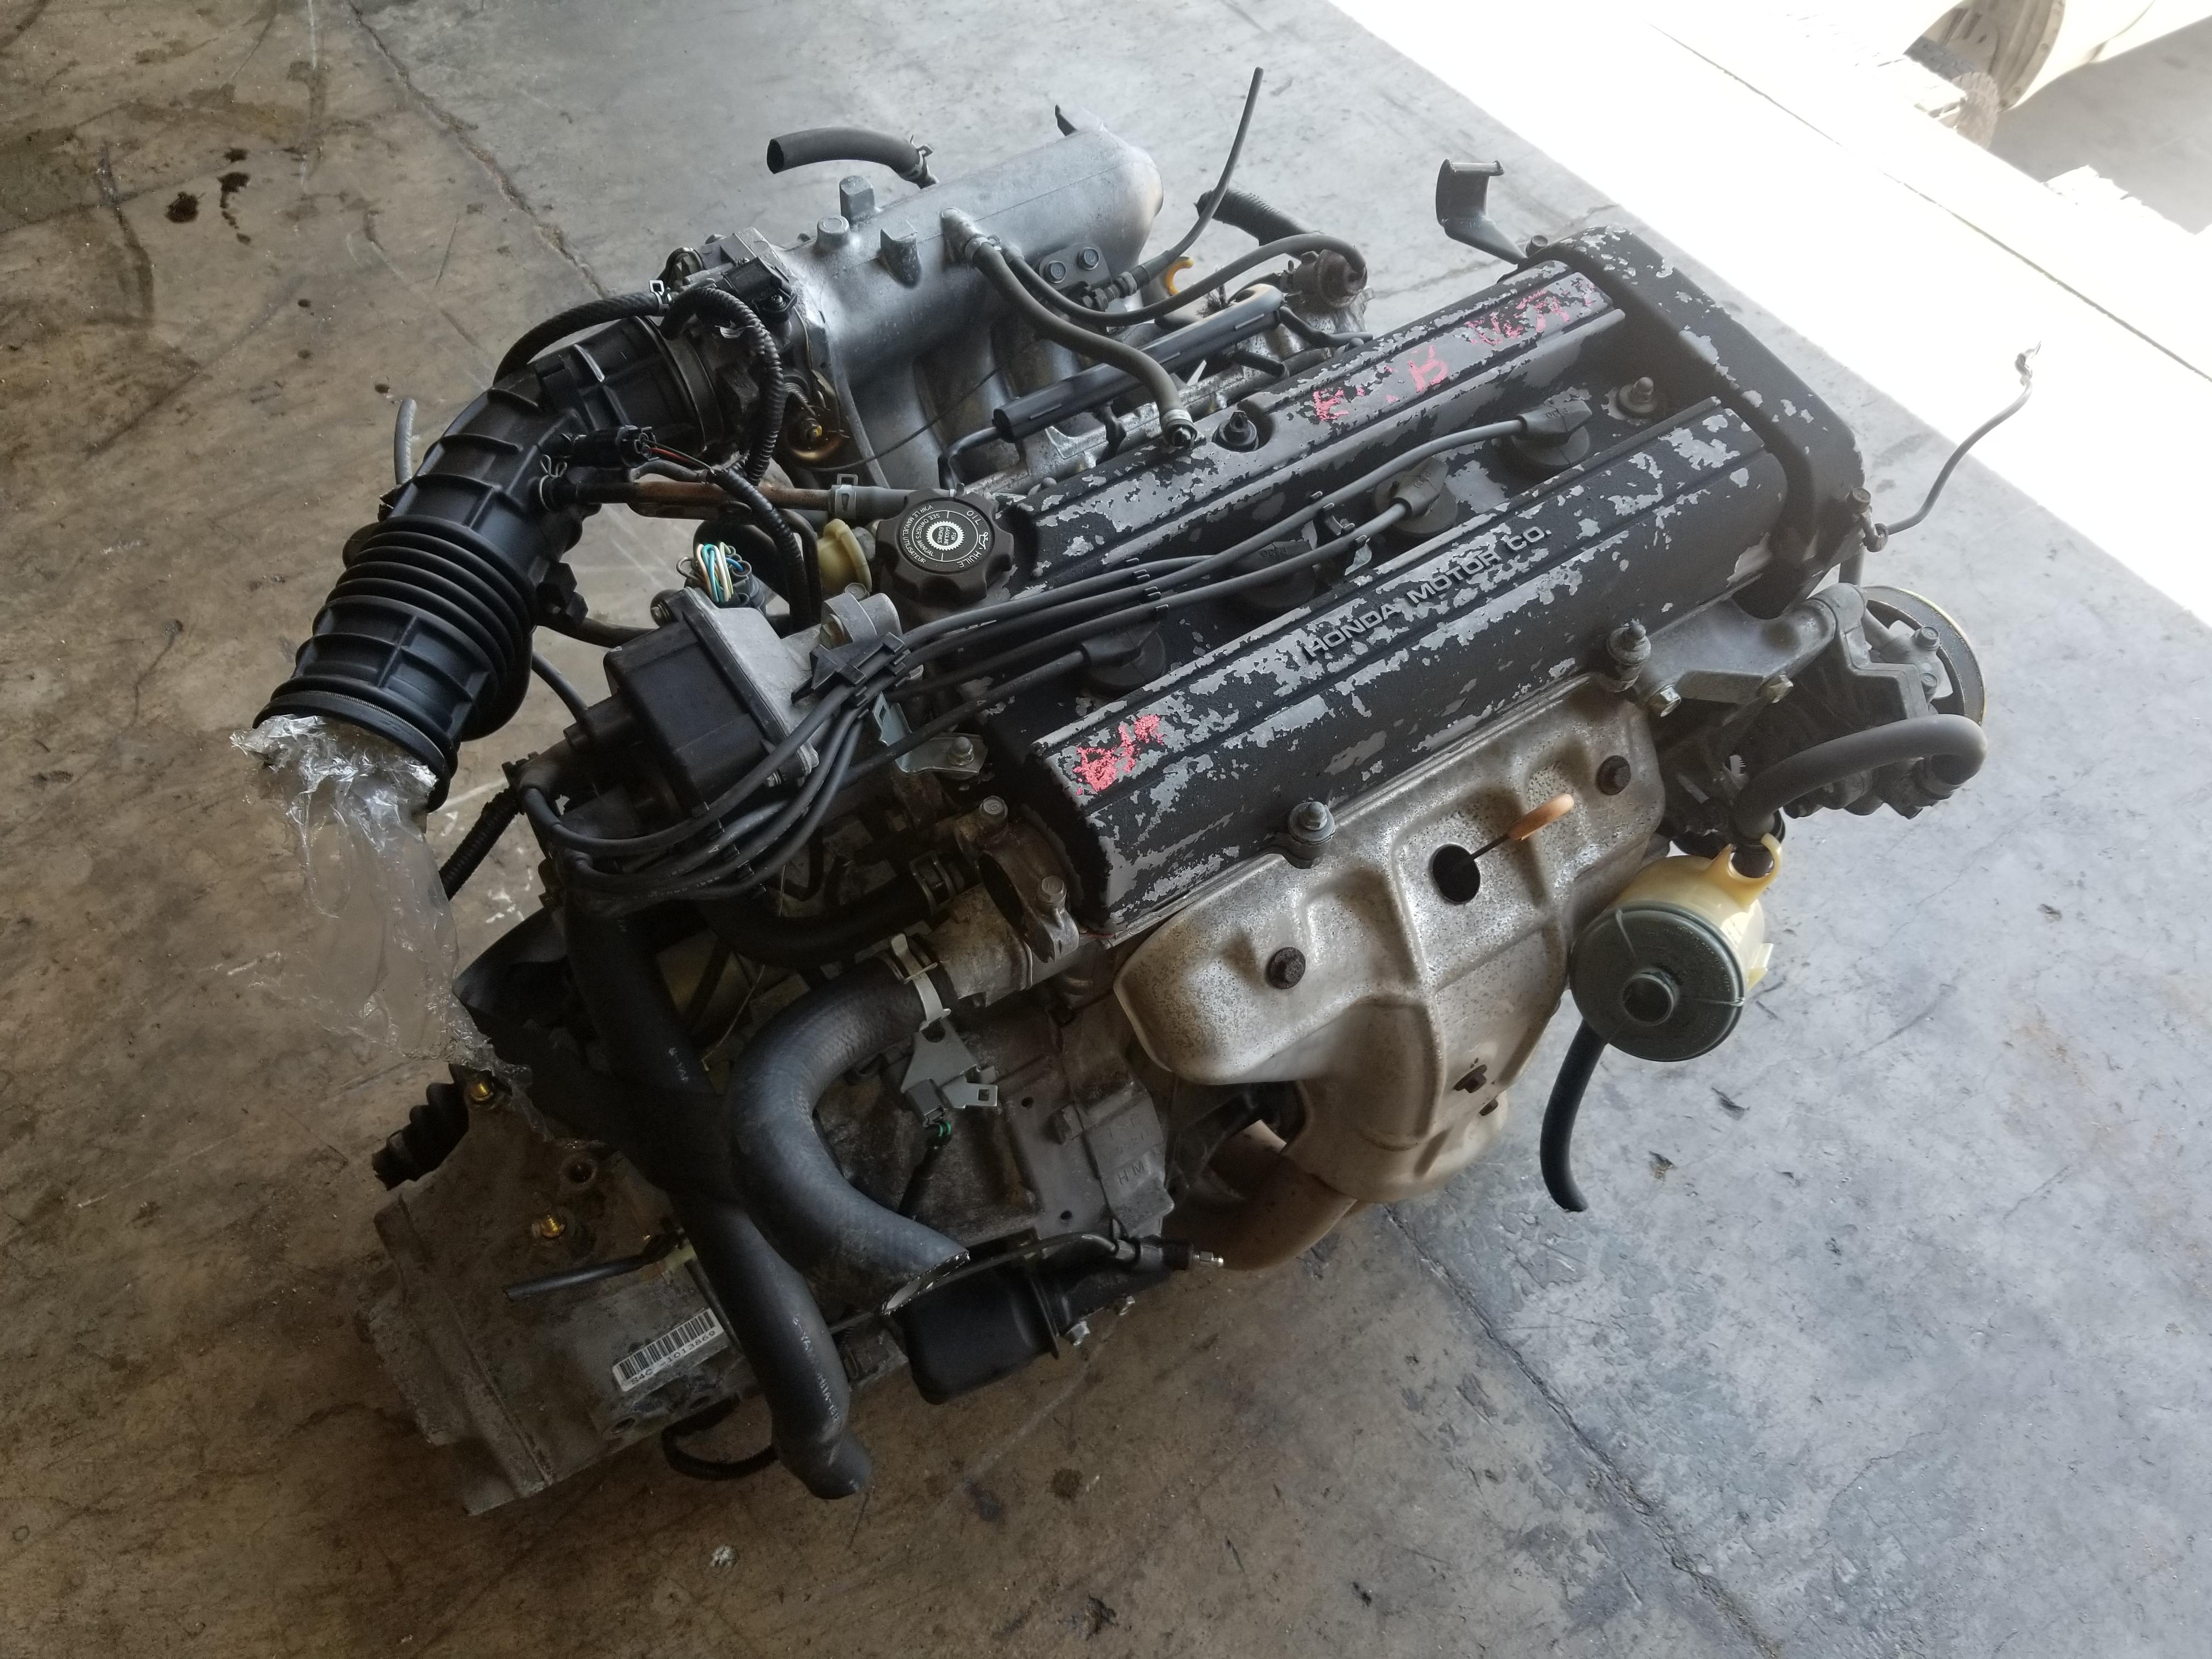 2001 Acura Integra Ls >> B18B 1994 2001 Acura Integra LS B18 1.8L Engine with S4C 5 ...